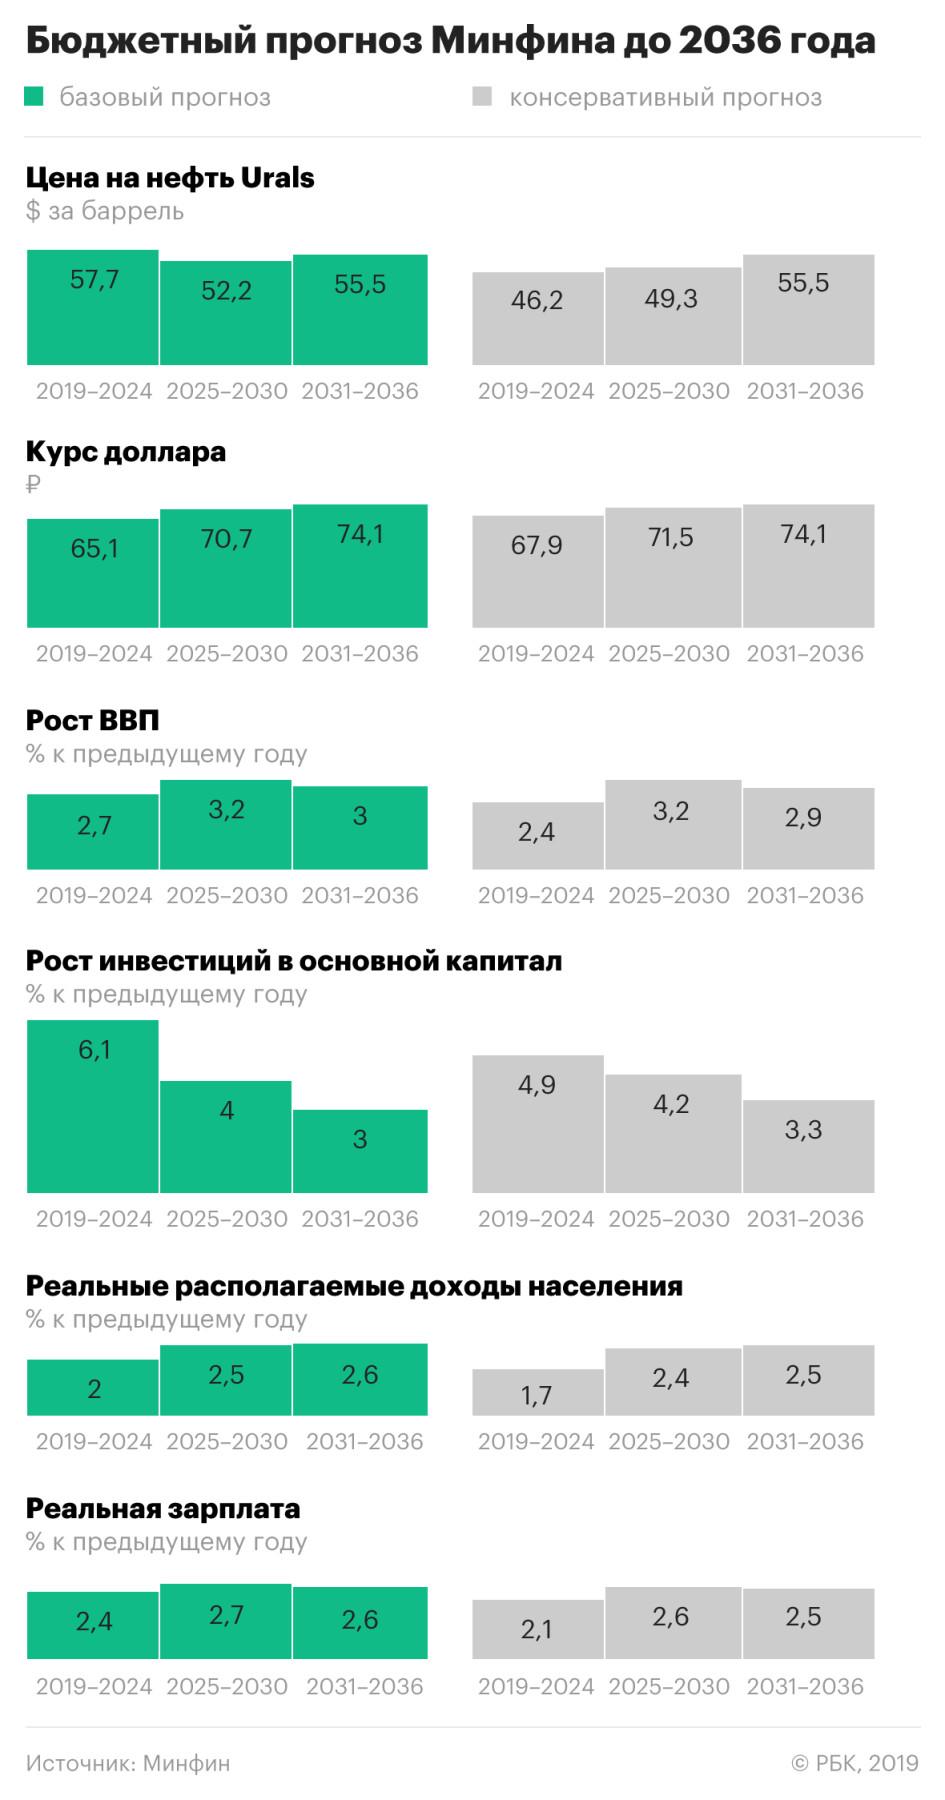 https://s0.rbk.ru/v6_top_pics/resized/945xH/media/img/6/61/755541293815616.jpeg